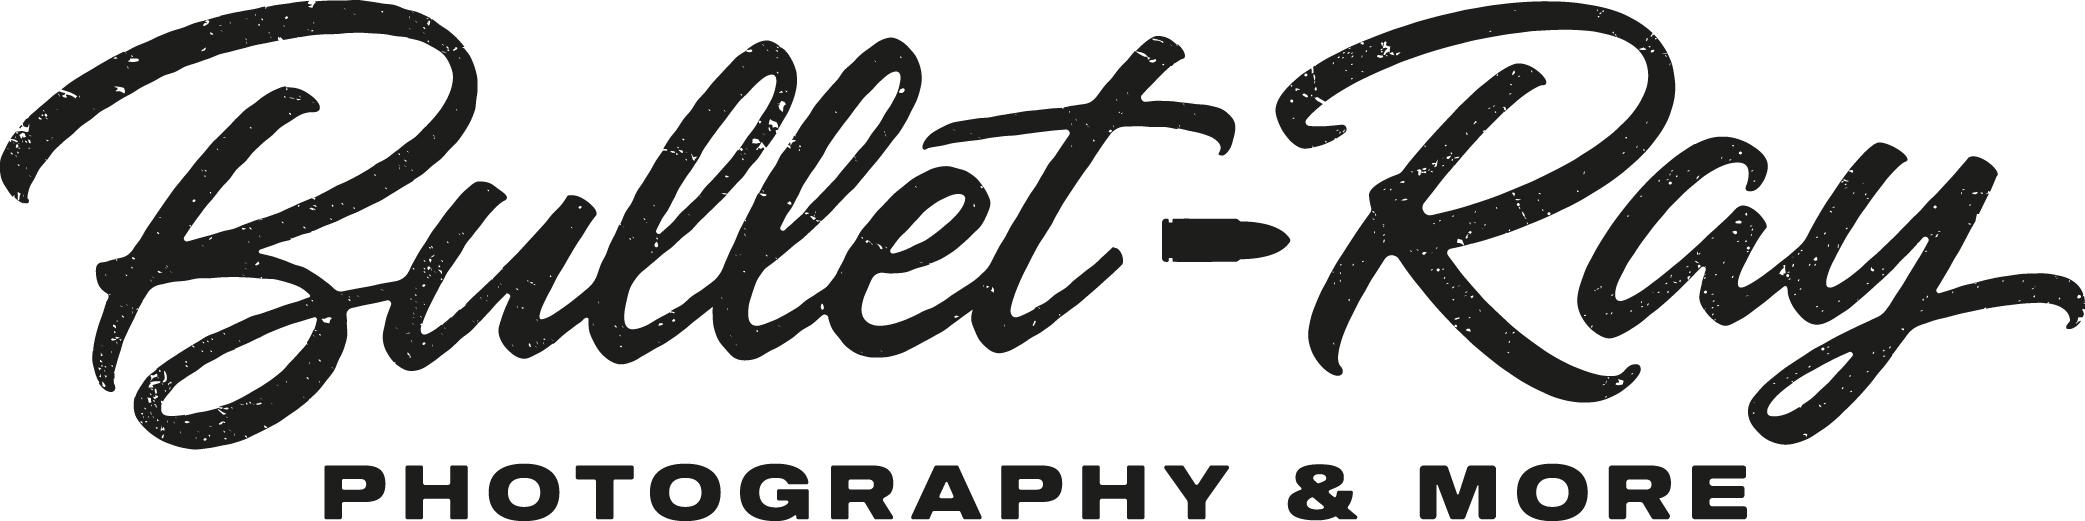 Bullet-ray Photo ART